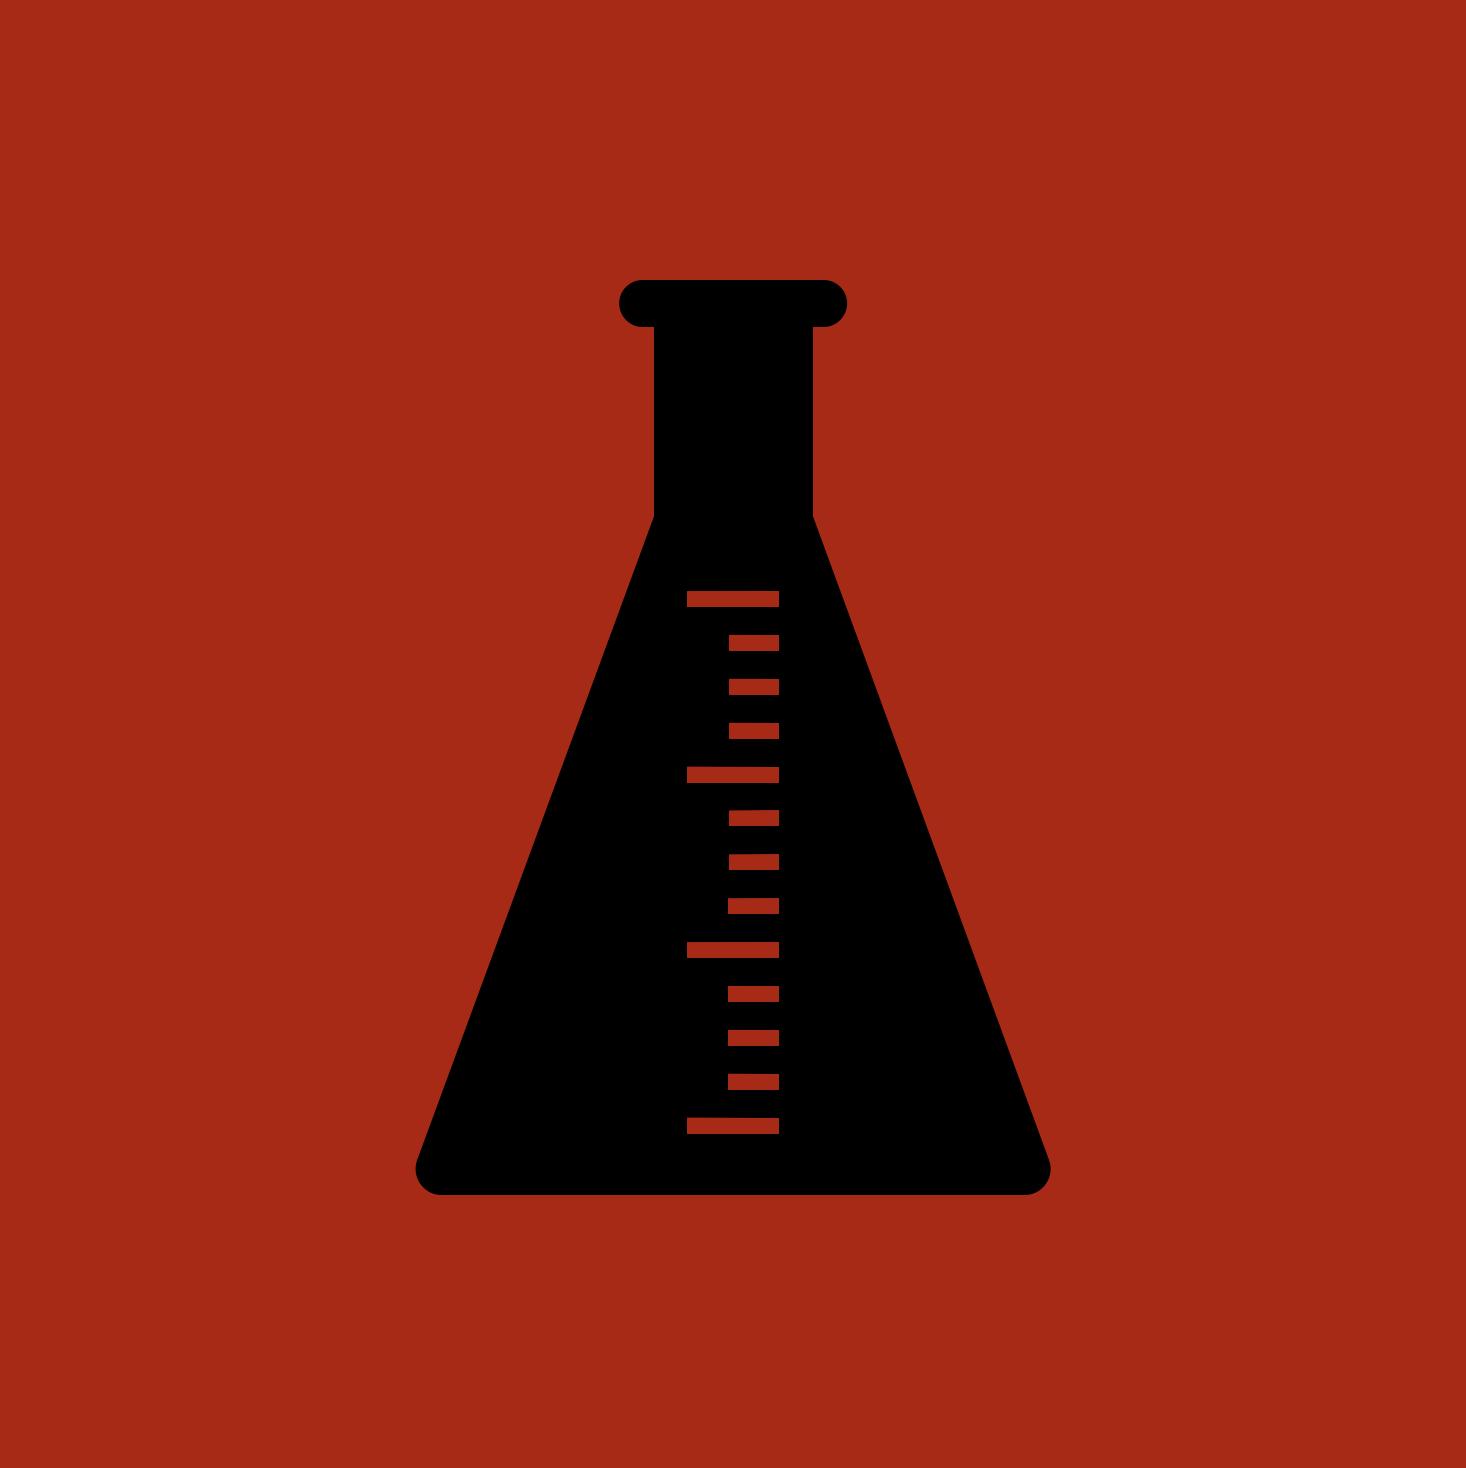 - Produktion: Labor & Reinraumtechnik